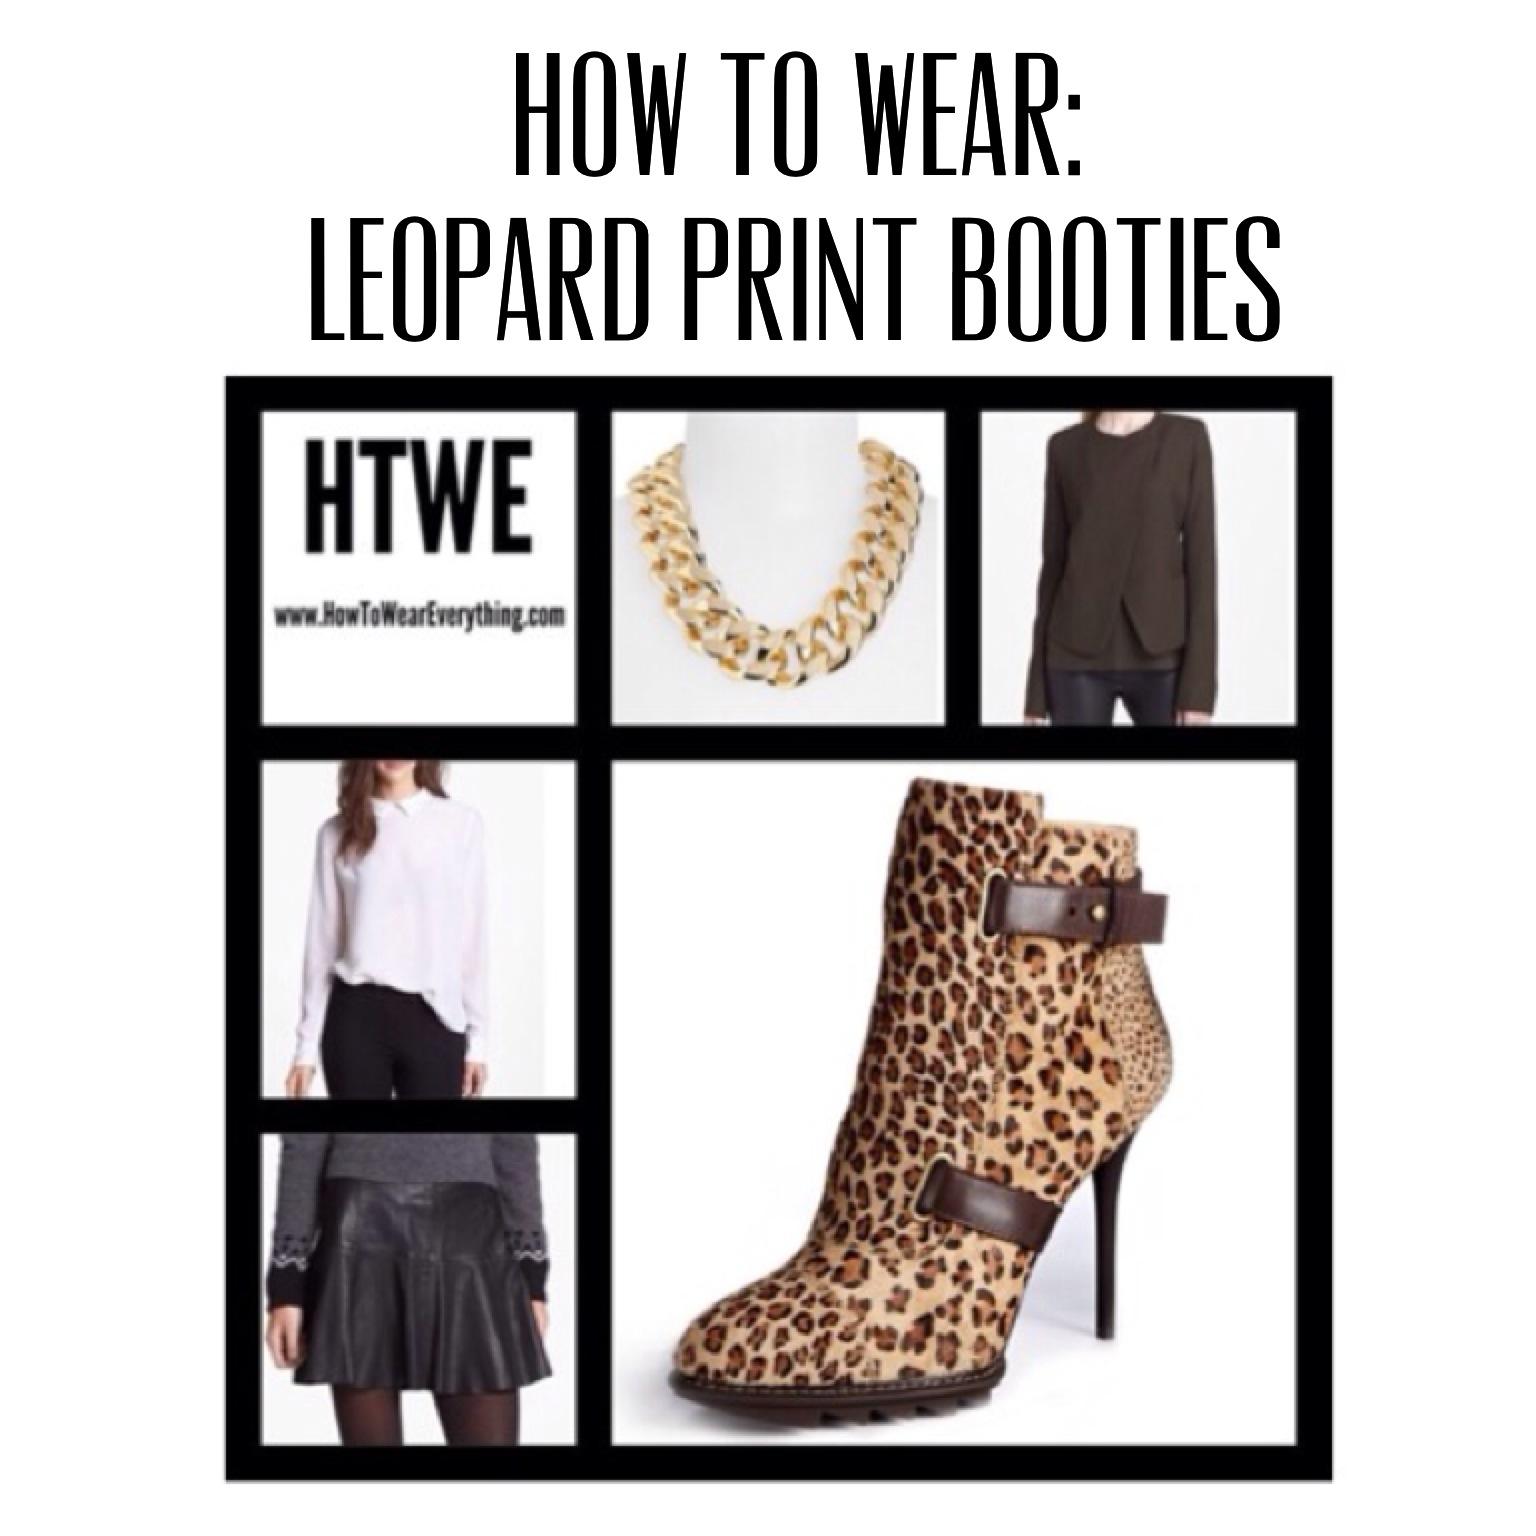 How To Wear: Leopard Print Booties